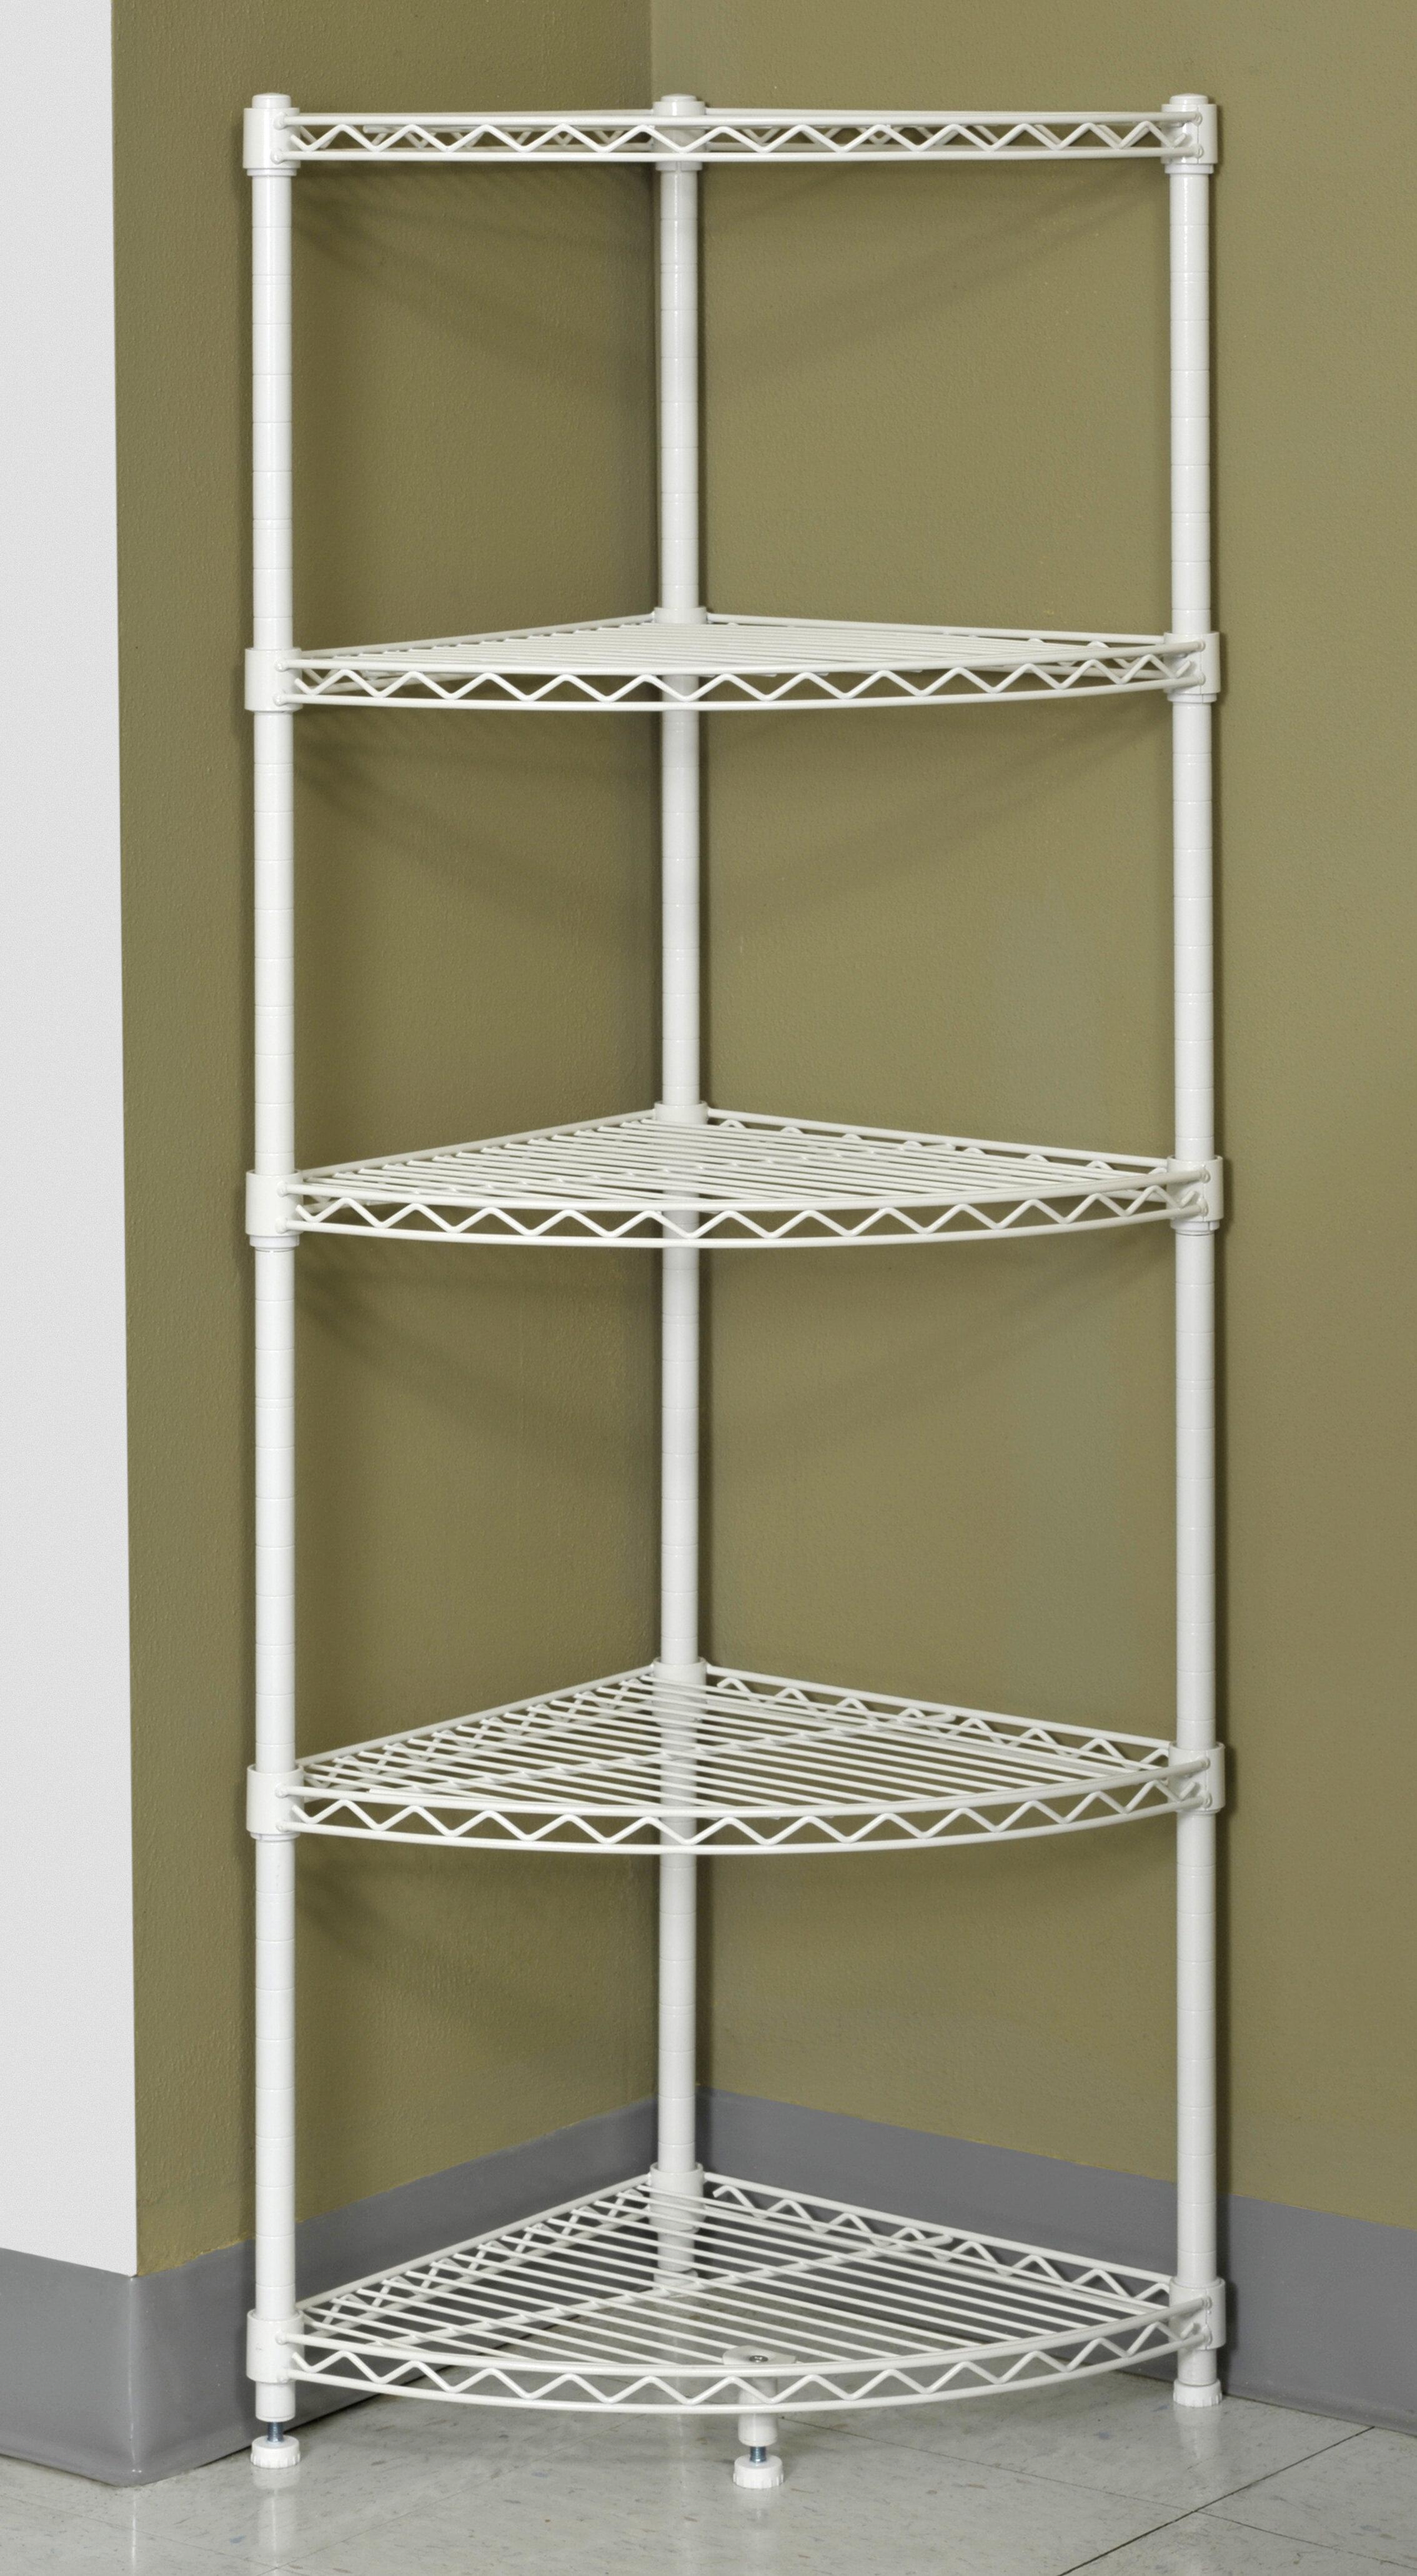 "11"" H x 11"" W 11-Shelf Steel Wire Corner Shelving Unit"